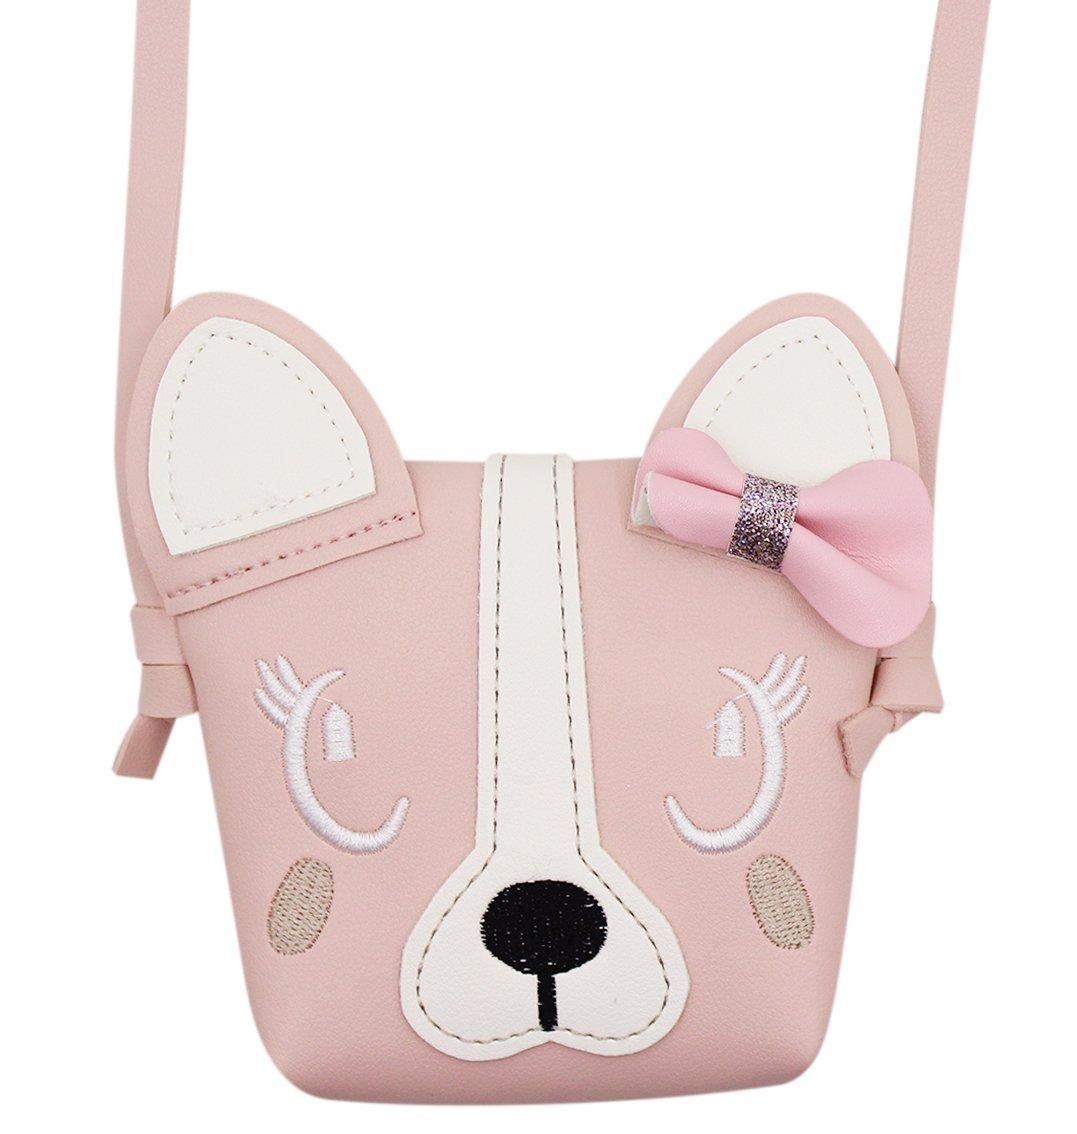 Bags us Fashion Cute Dog Bowknot Single Shoulder Bag Coin Purse Small Crossbody Satchel handbags Wallet